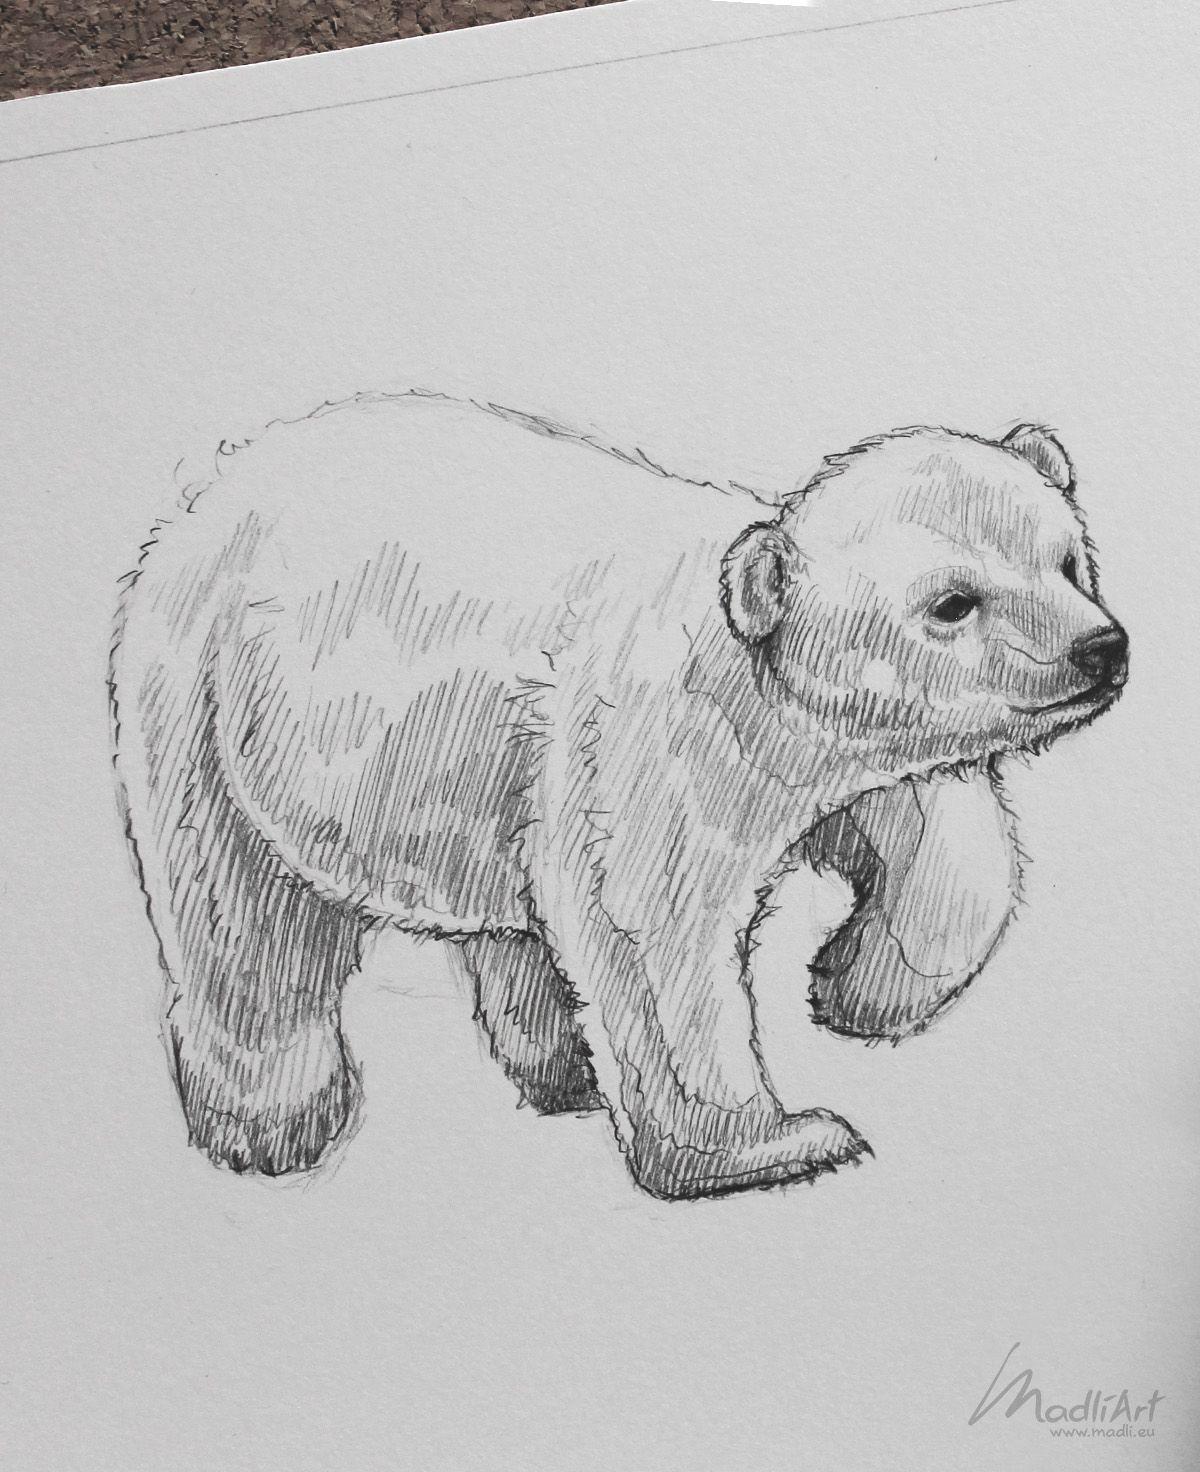 Endangered Animals Drawing : endangered, animals, drawing, Sketchbook, Portfolio, Endangered, Vulnerable, Threatened, Species, Animals, Ideas, Sketches, Penci…, Polar, Drawing,, Sketch